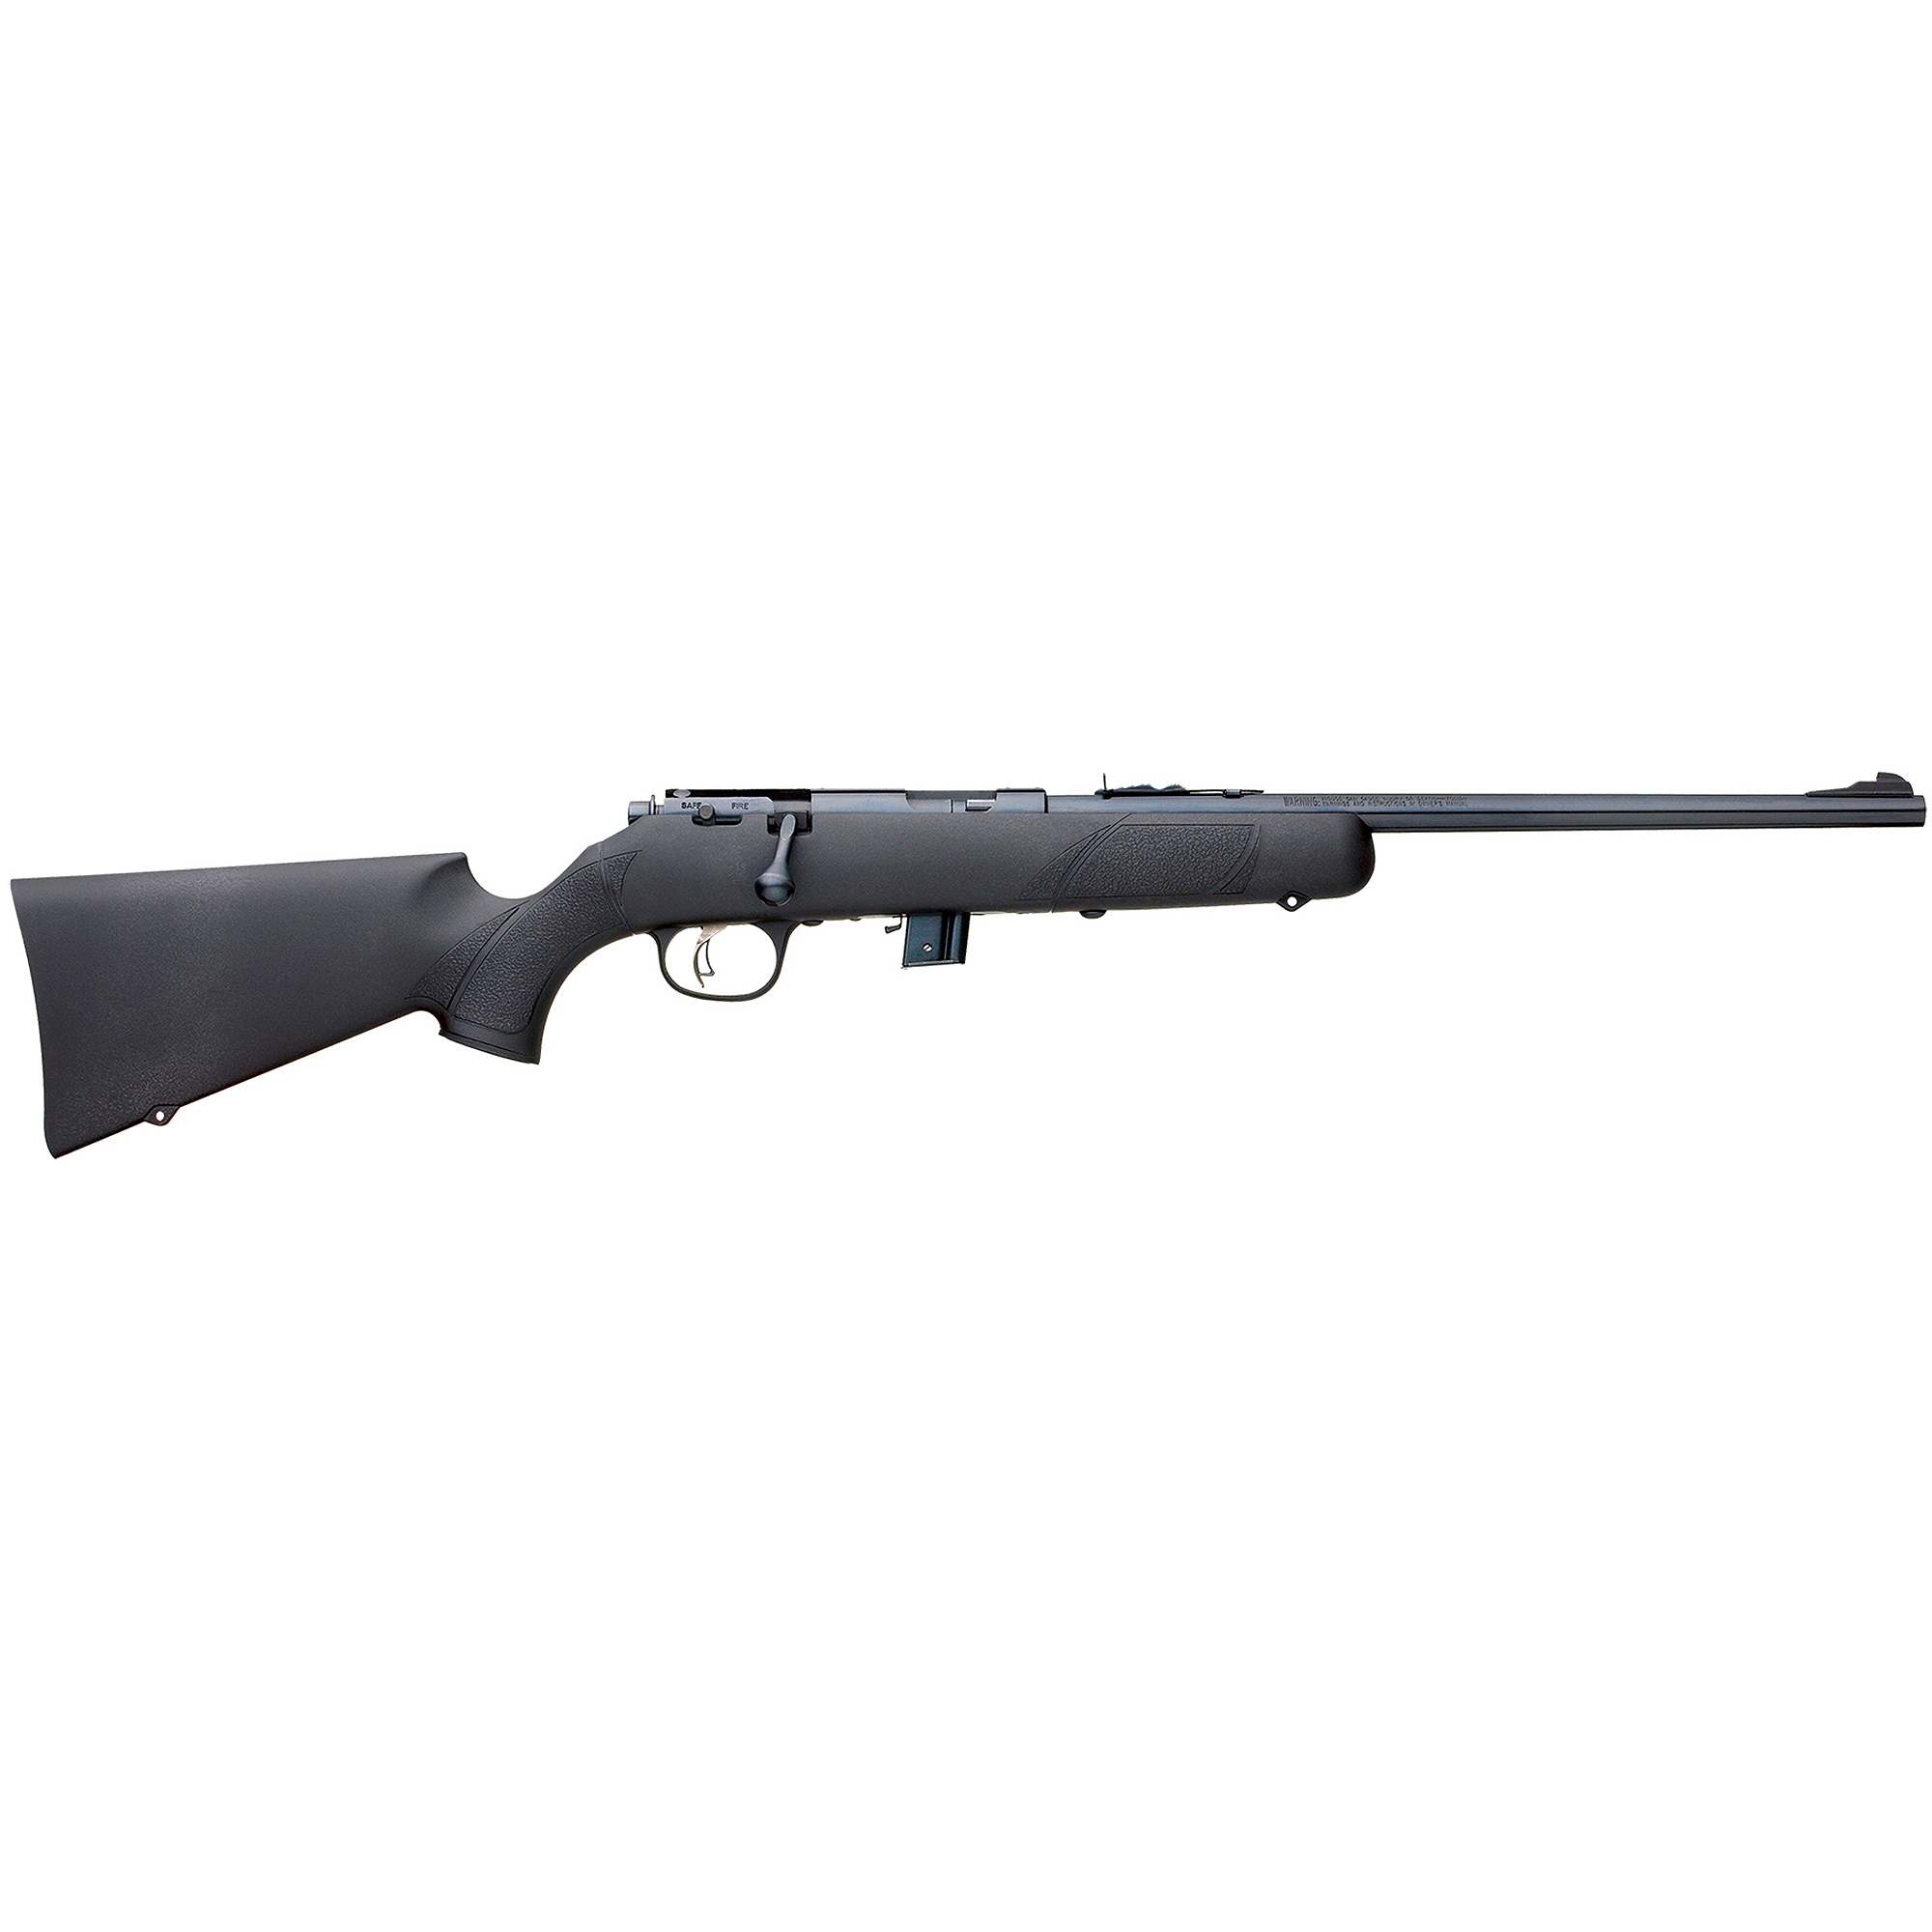 "DO NOT PUBLISH Marlin 70691 XT-22YR Youth Bolt Action Rifle, 22 Short/Long/Long Rifle, 16.25"", 7+1 Capacity, 1rd Black Synthetic Stock, Blue Finish"